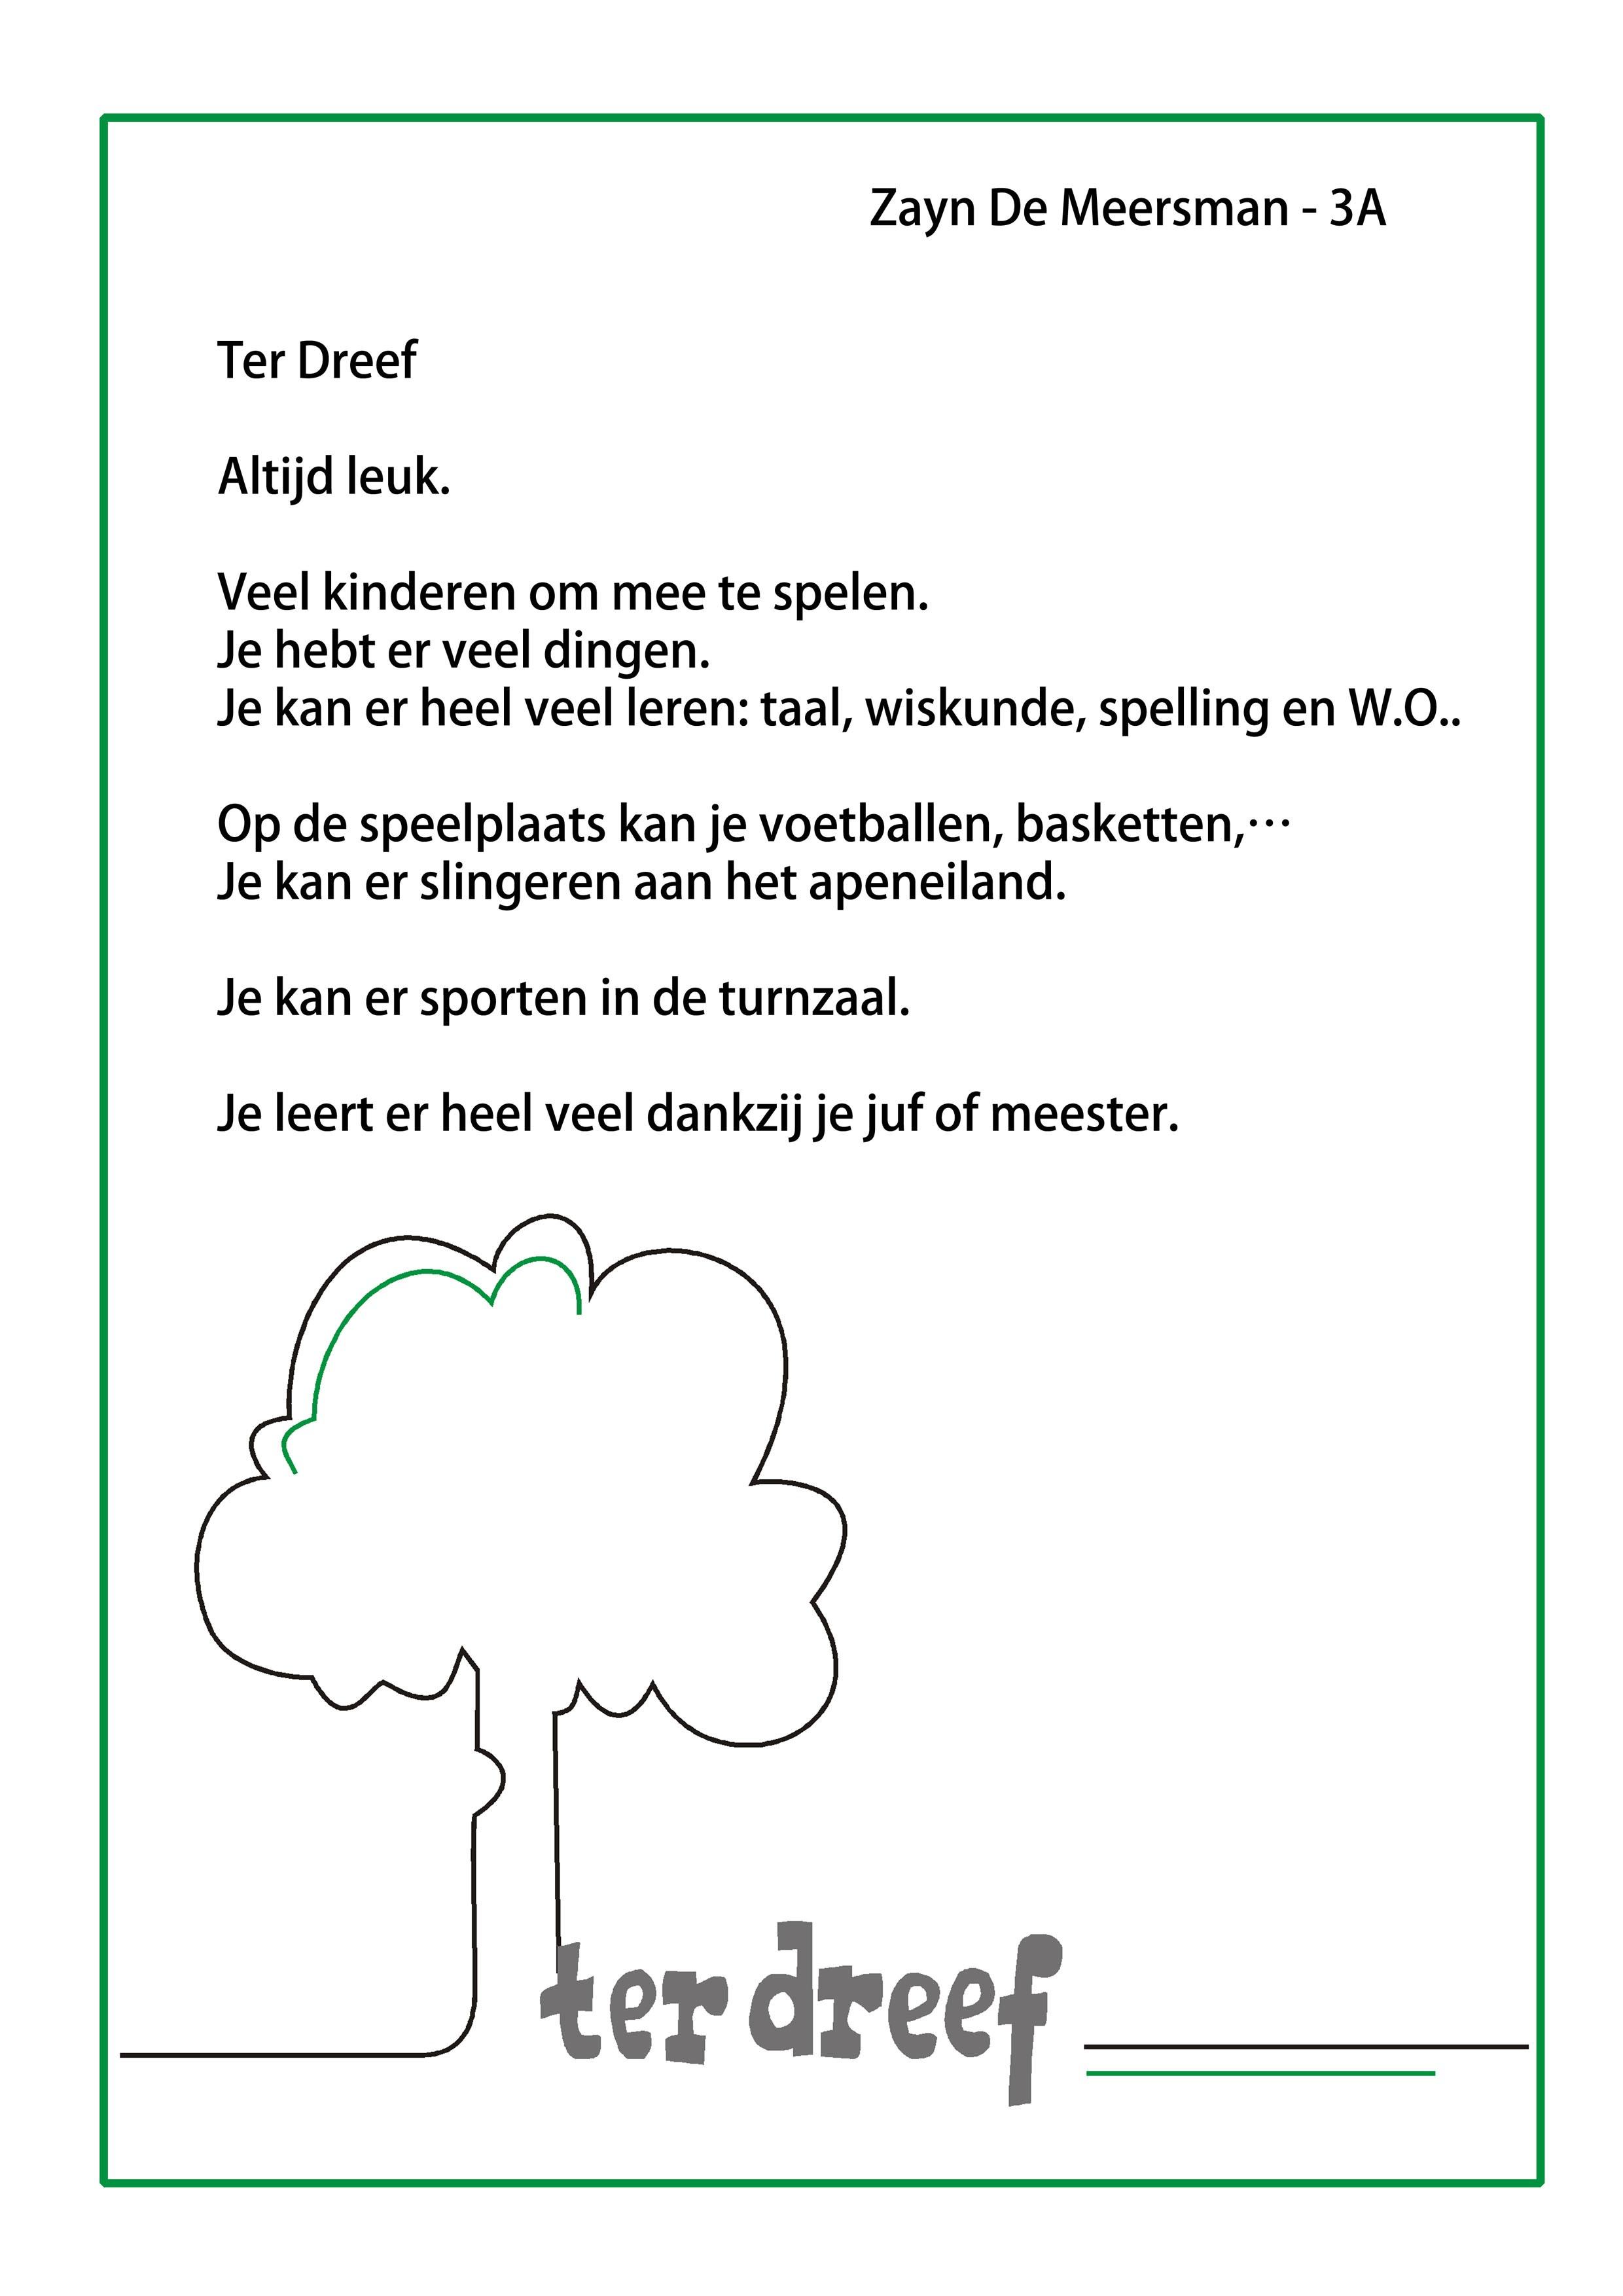 Zayn-De-Meersman-3A-A4